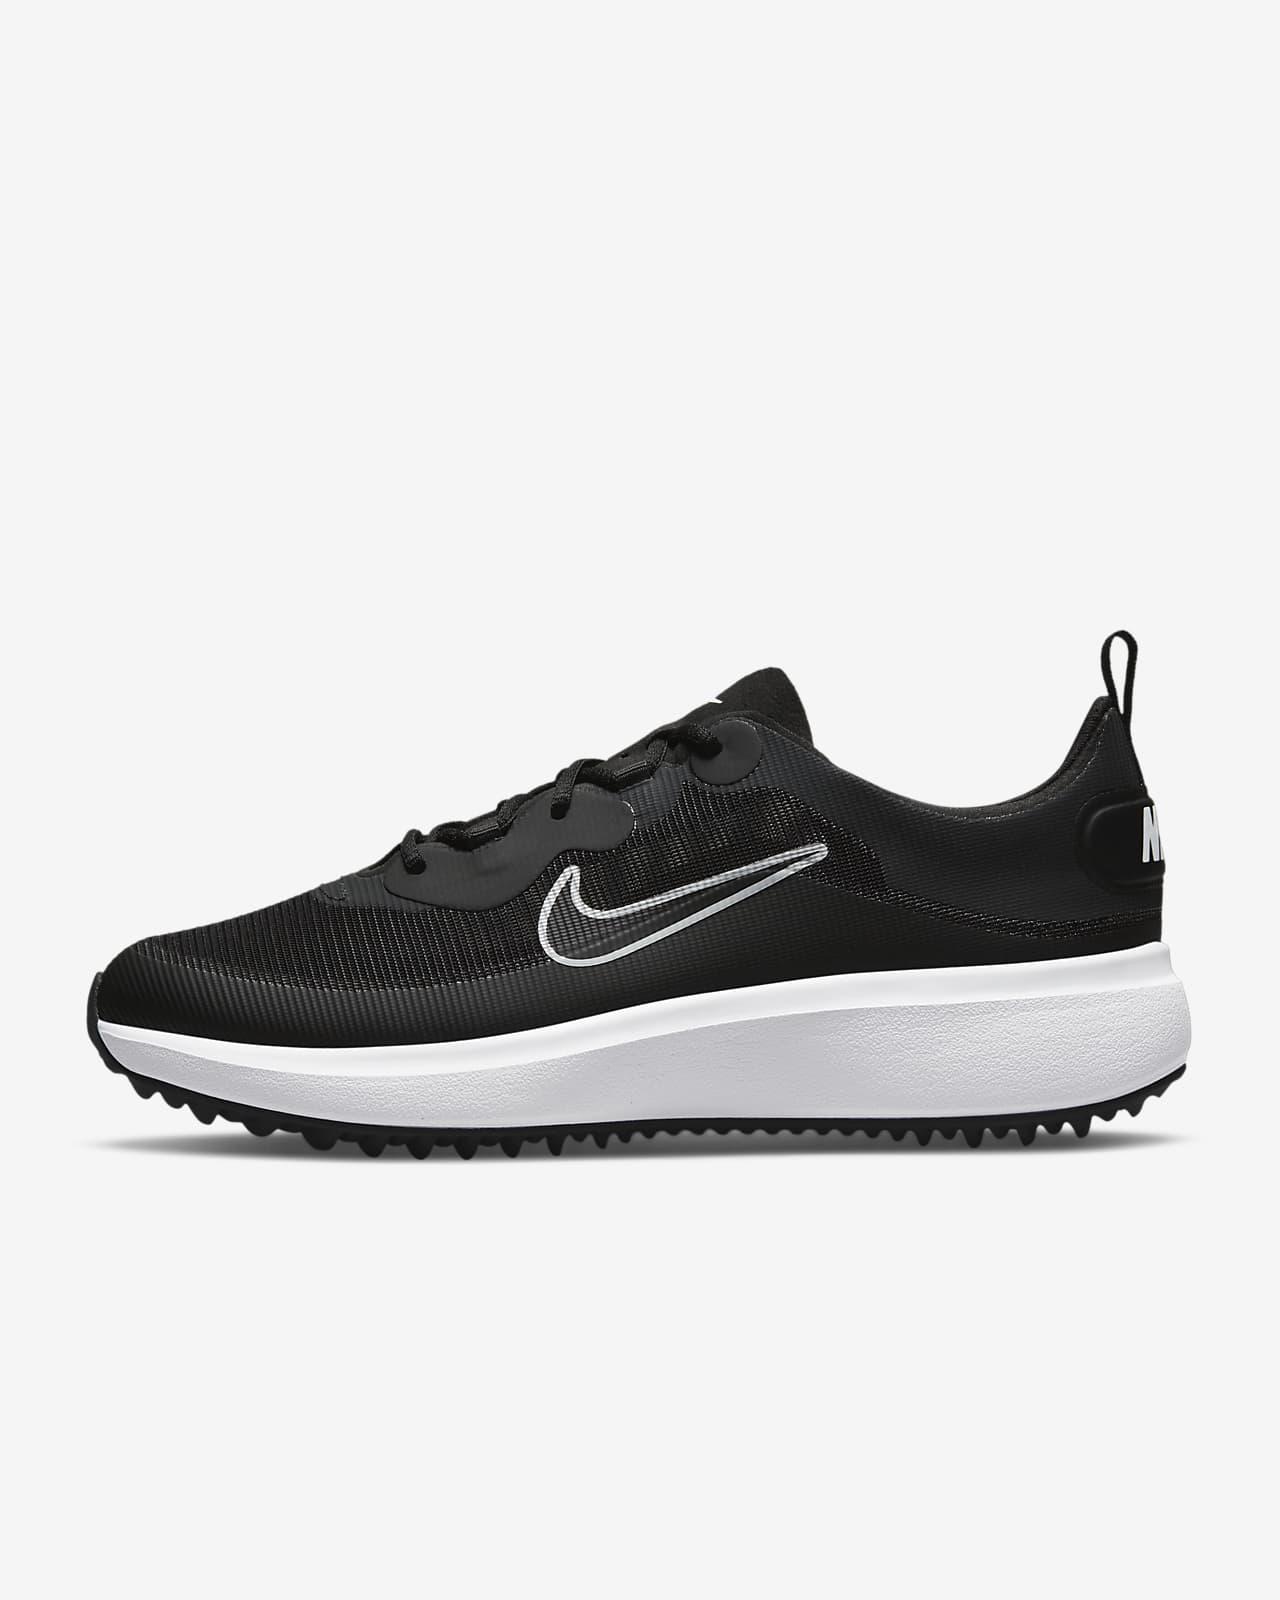 Chaussure de golf Nike Ace Summerlite pour Femme. Nike LU